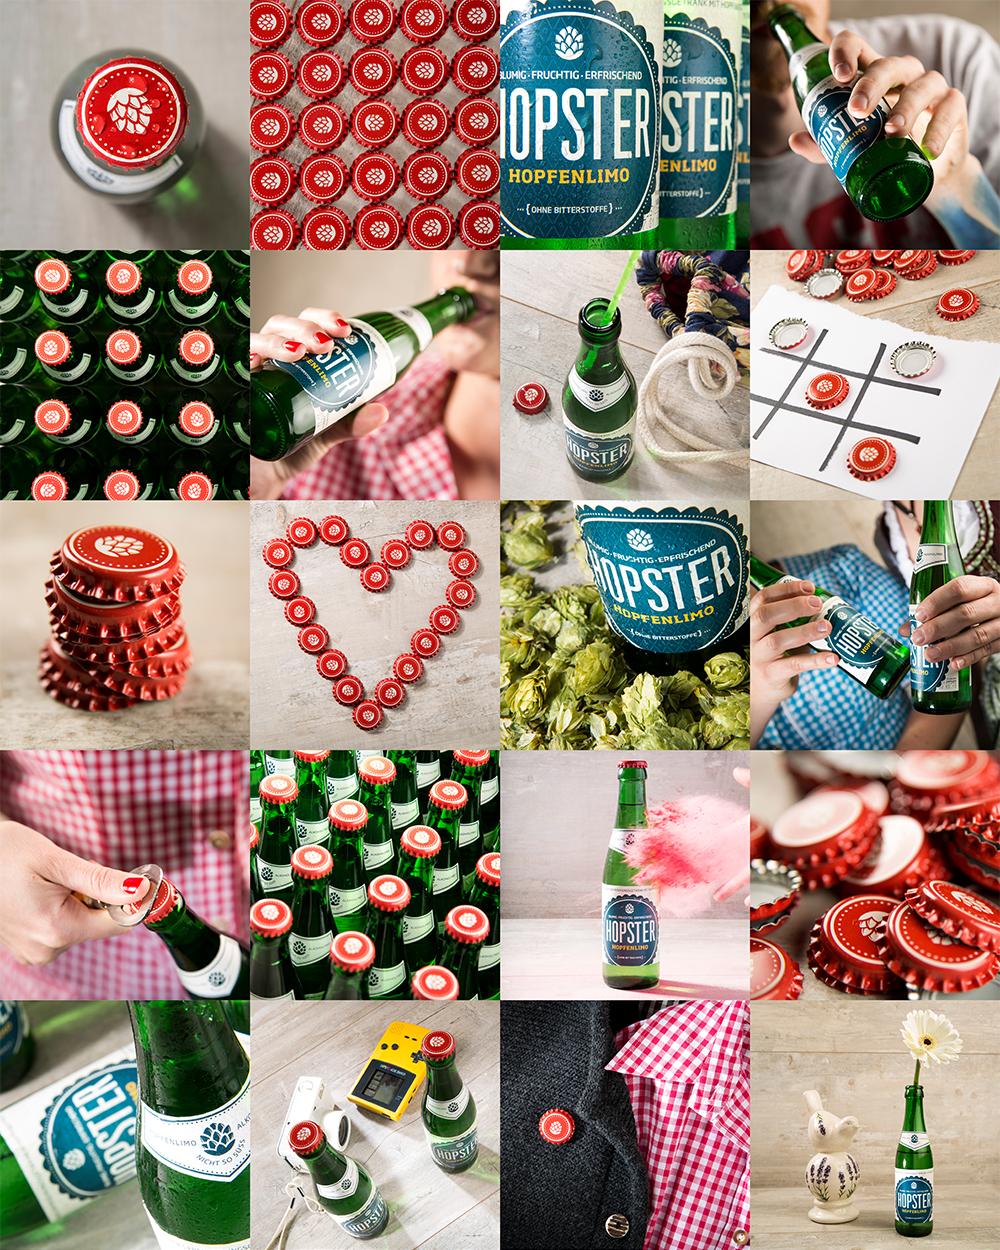 Riegg & Partner Produktfotografie Hopster